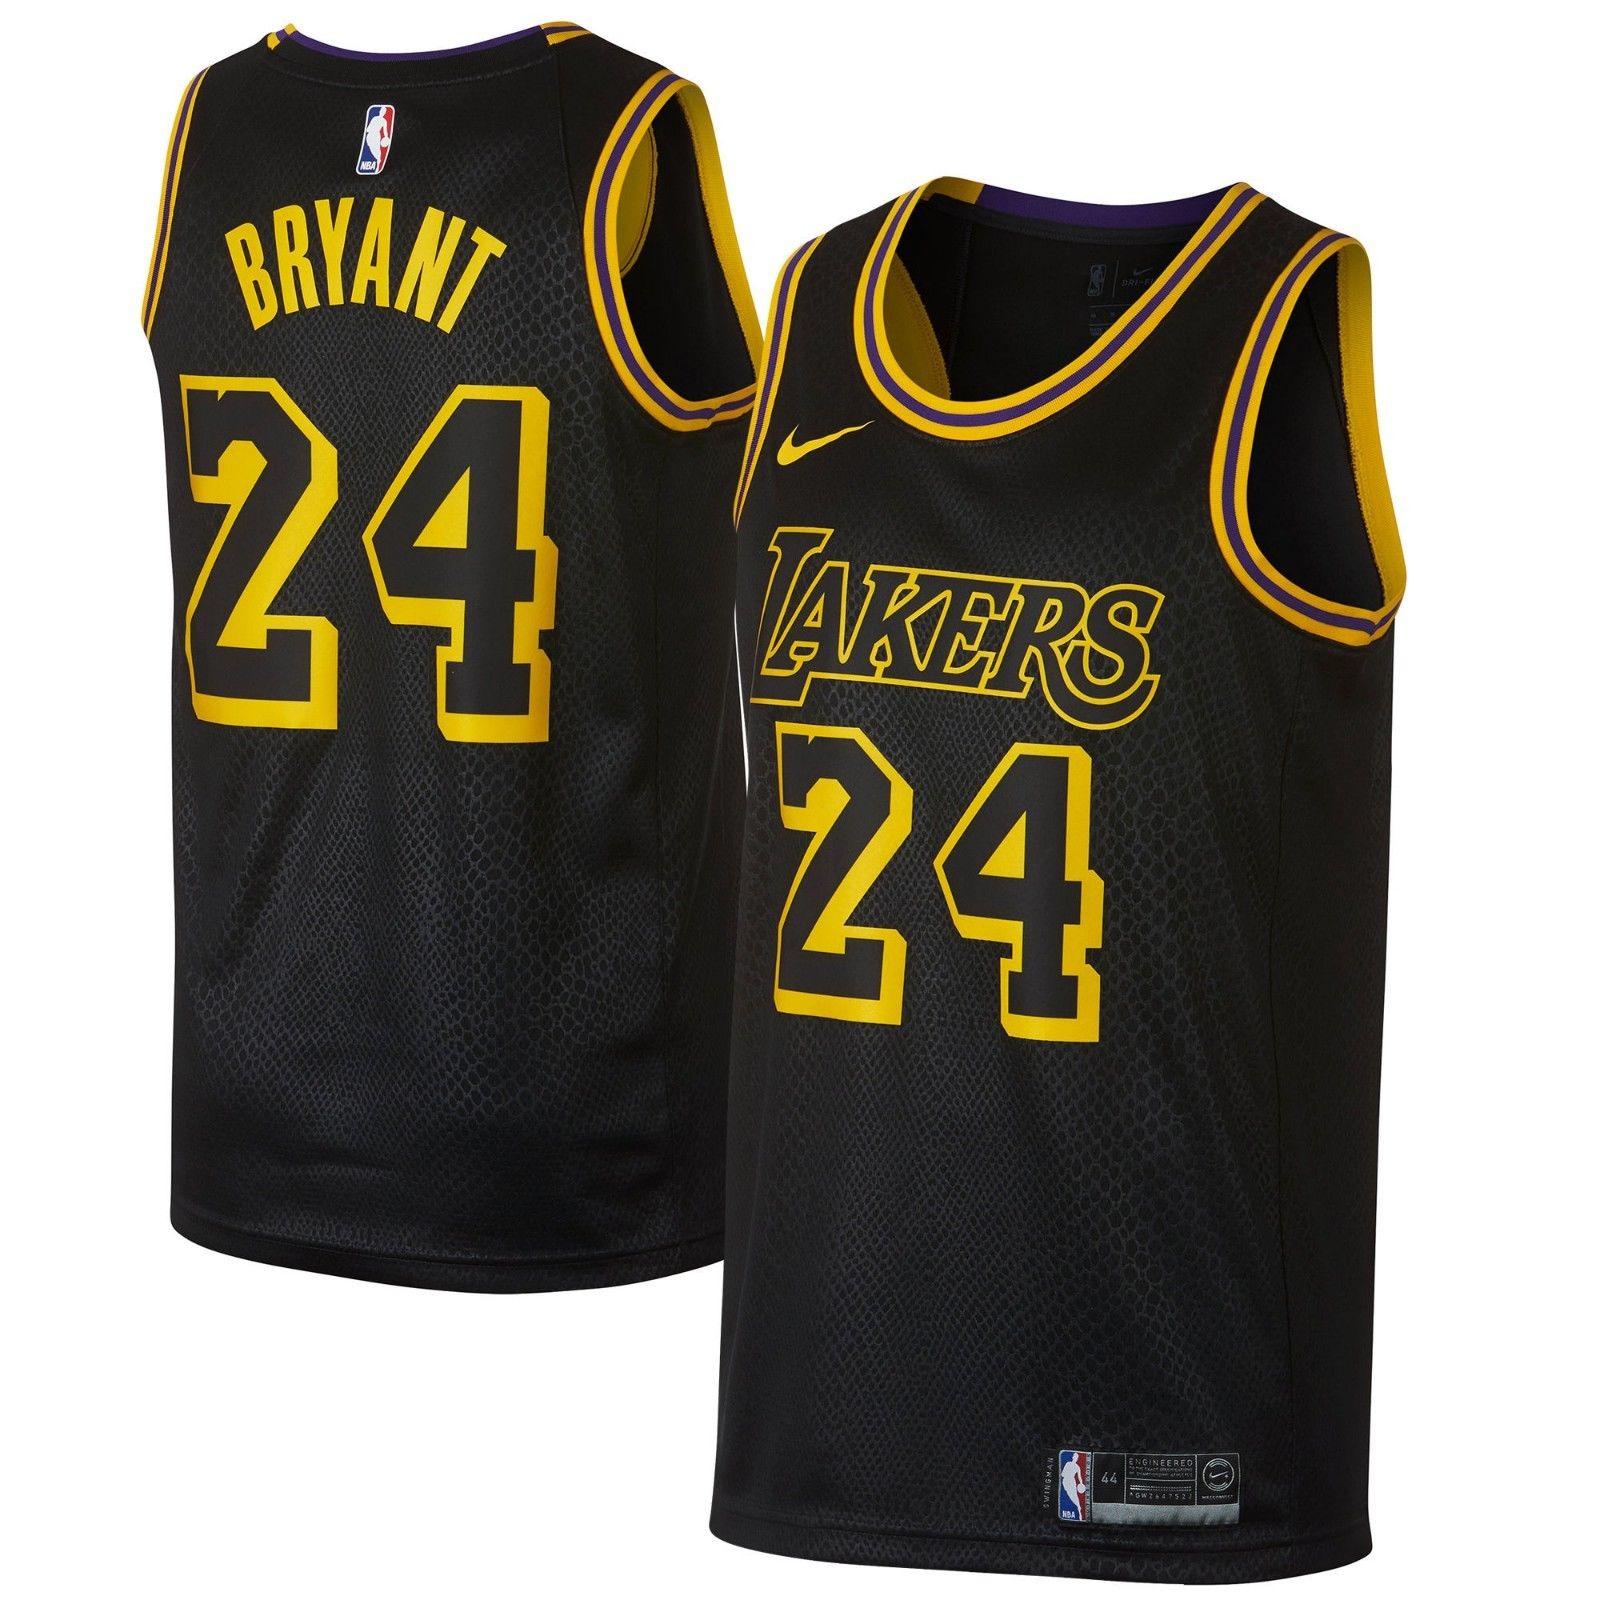 promo code 9477f f7a14 Nike NBA Los Angeles Lakers Kobe Bryant #24 Swingman City Edition Men's  Jersey - PNW Sports Apparel